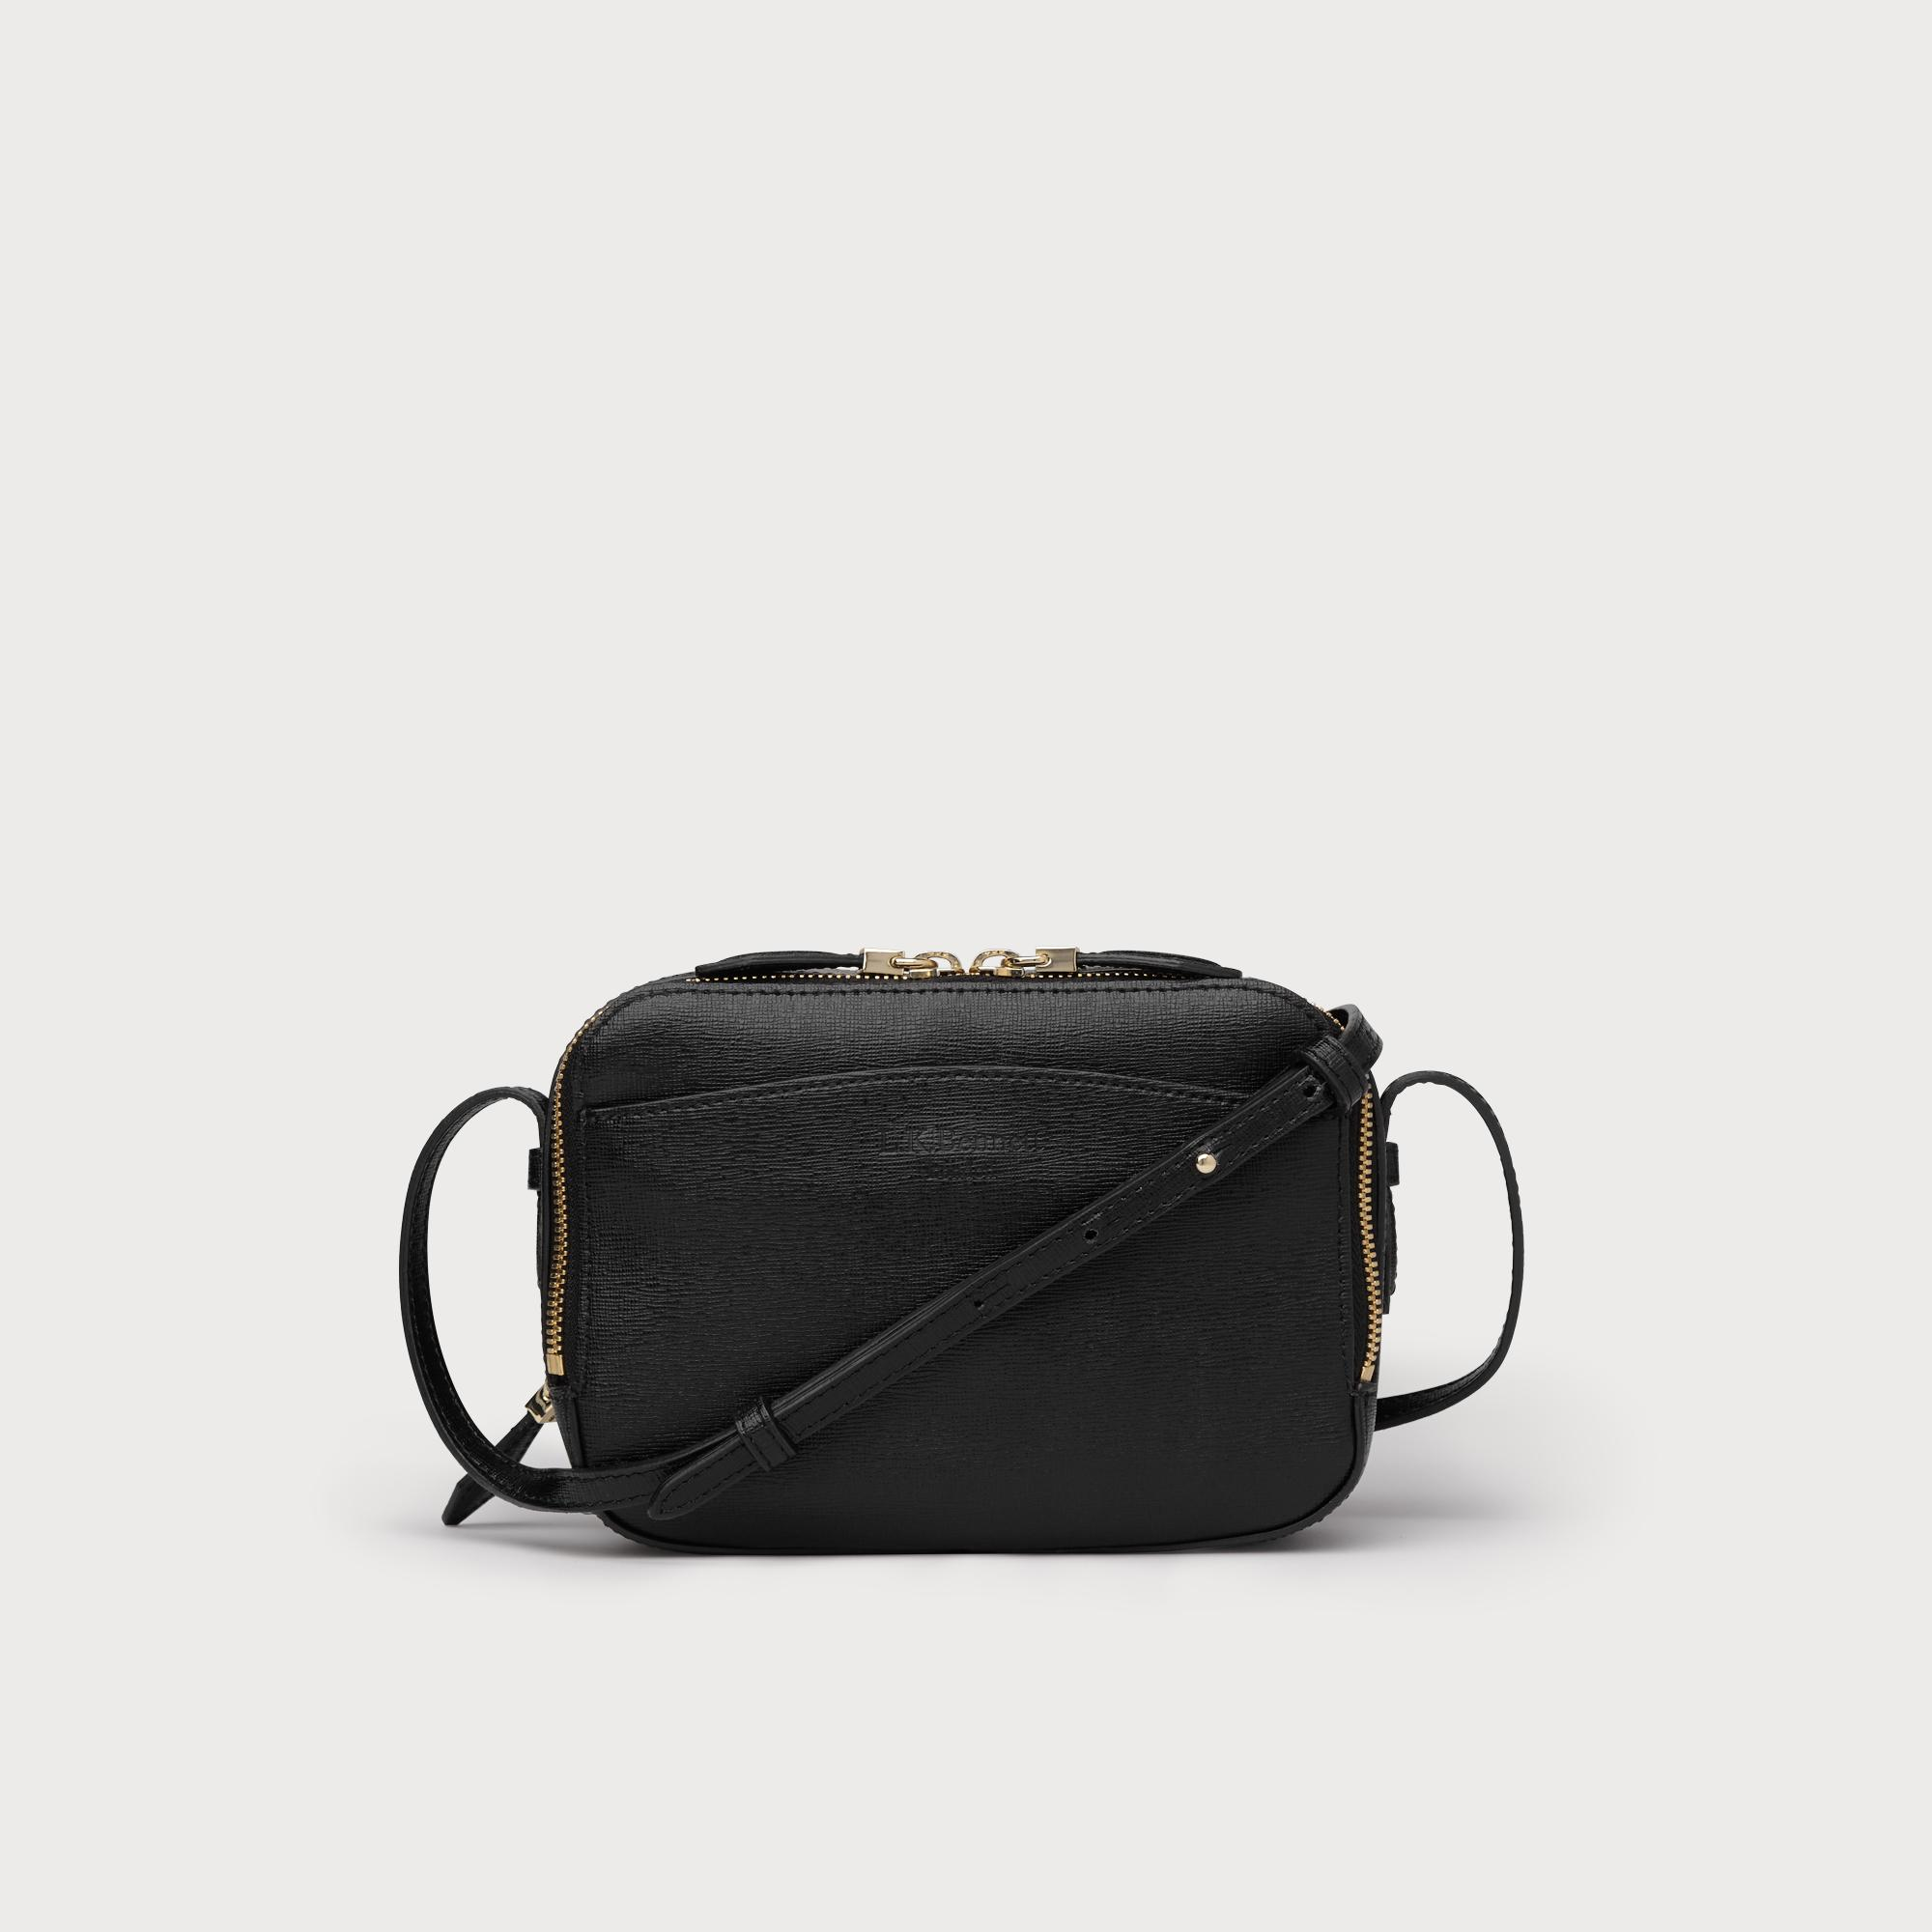 Mariel Black Leather Crossbody Bag